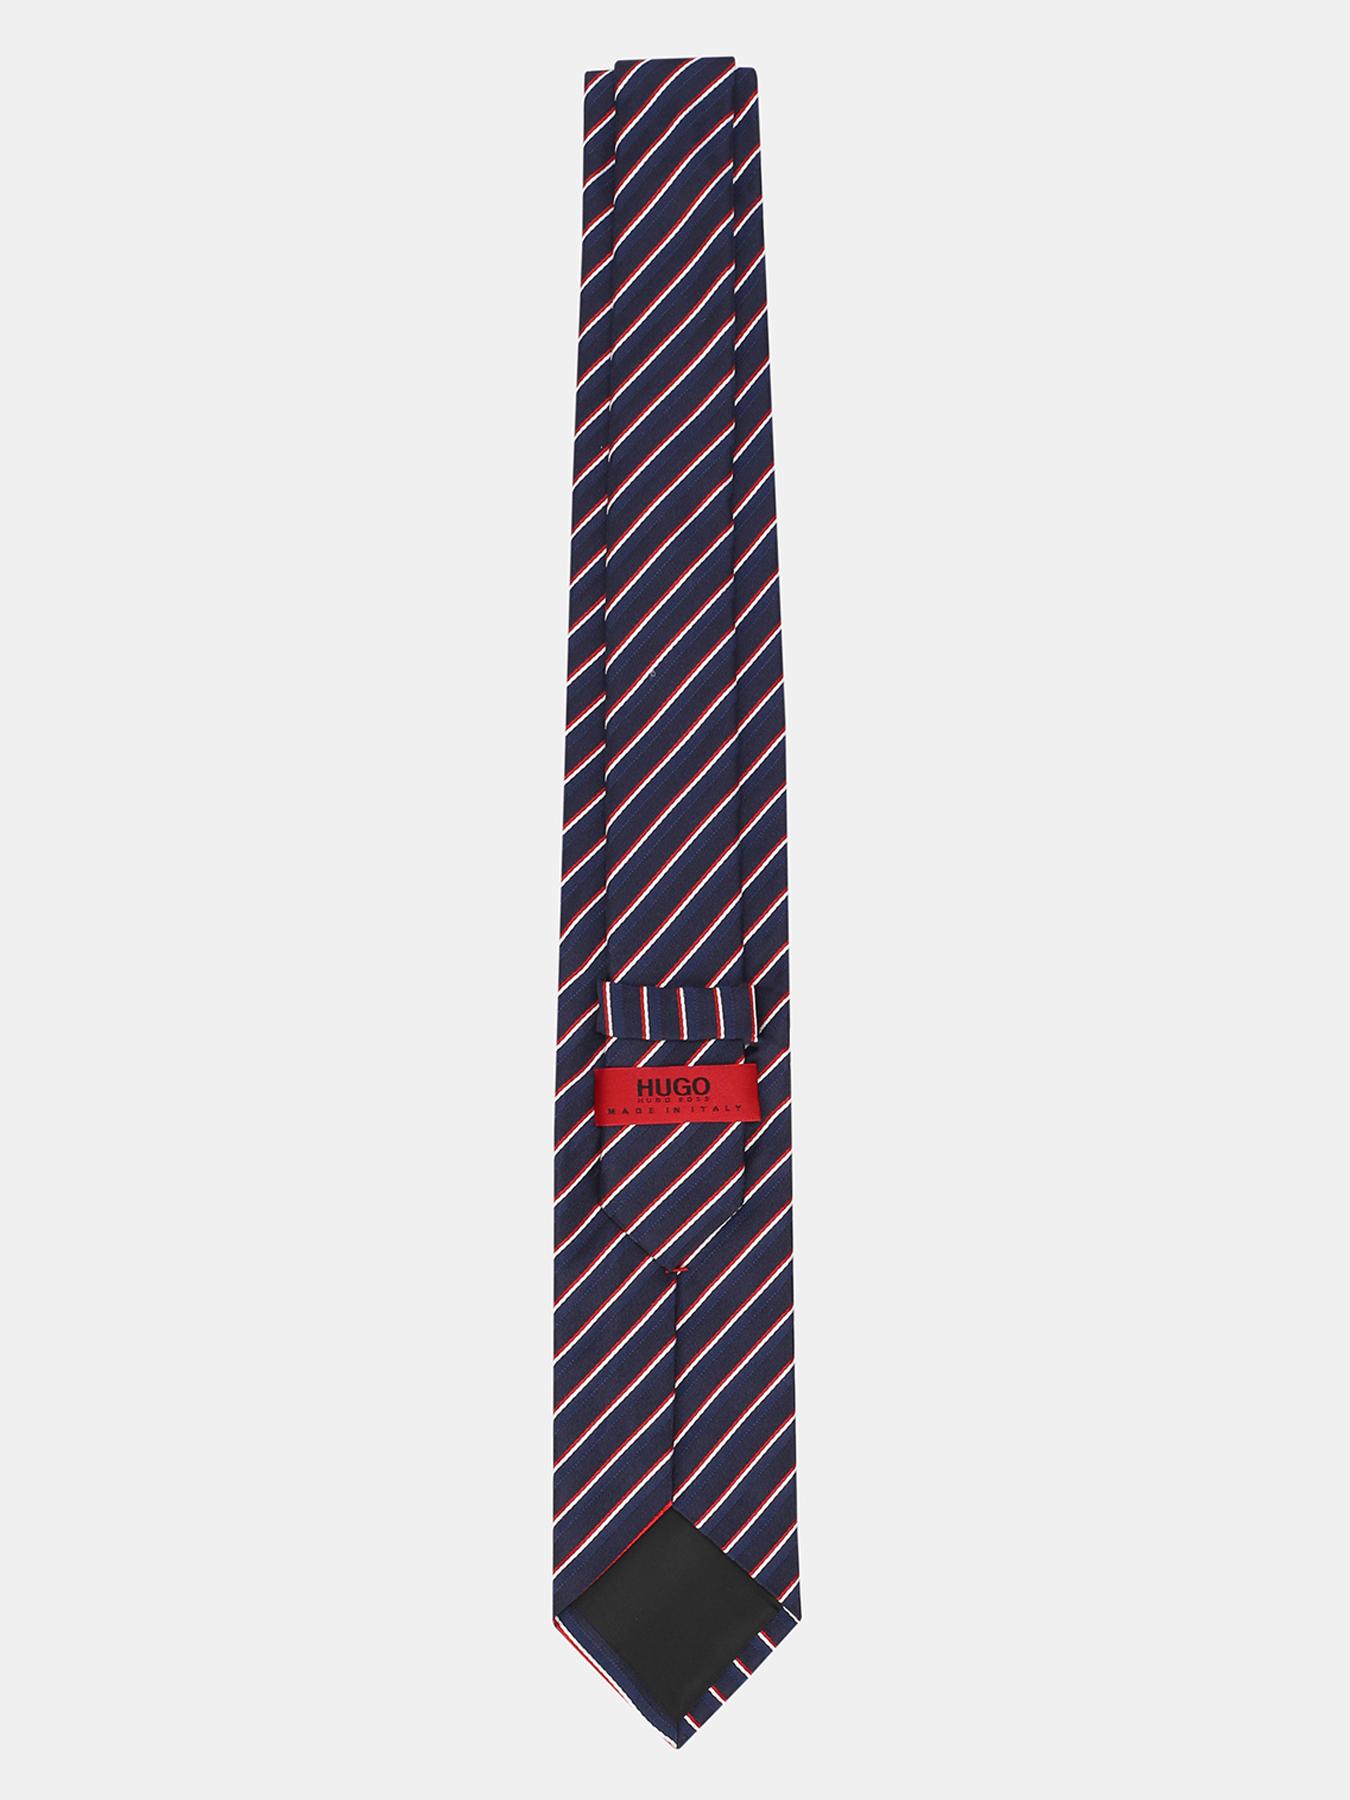 Фото - HUGO Галстук Tie floral pattern bow tie dress